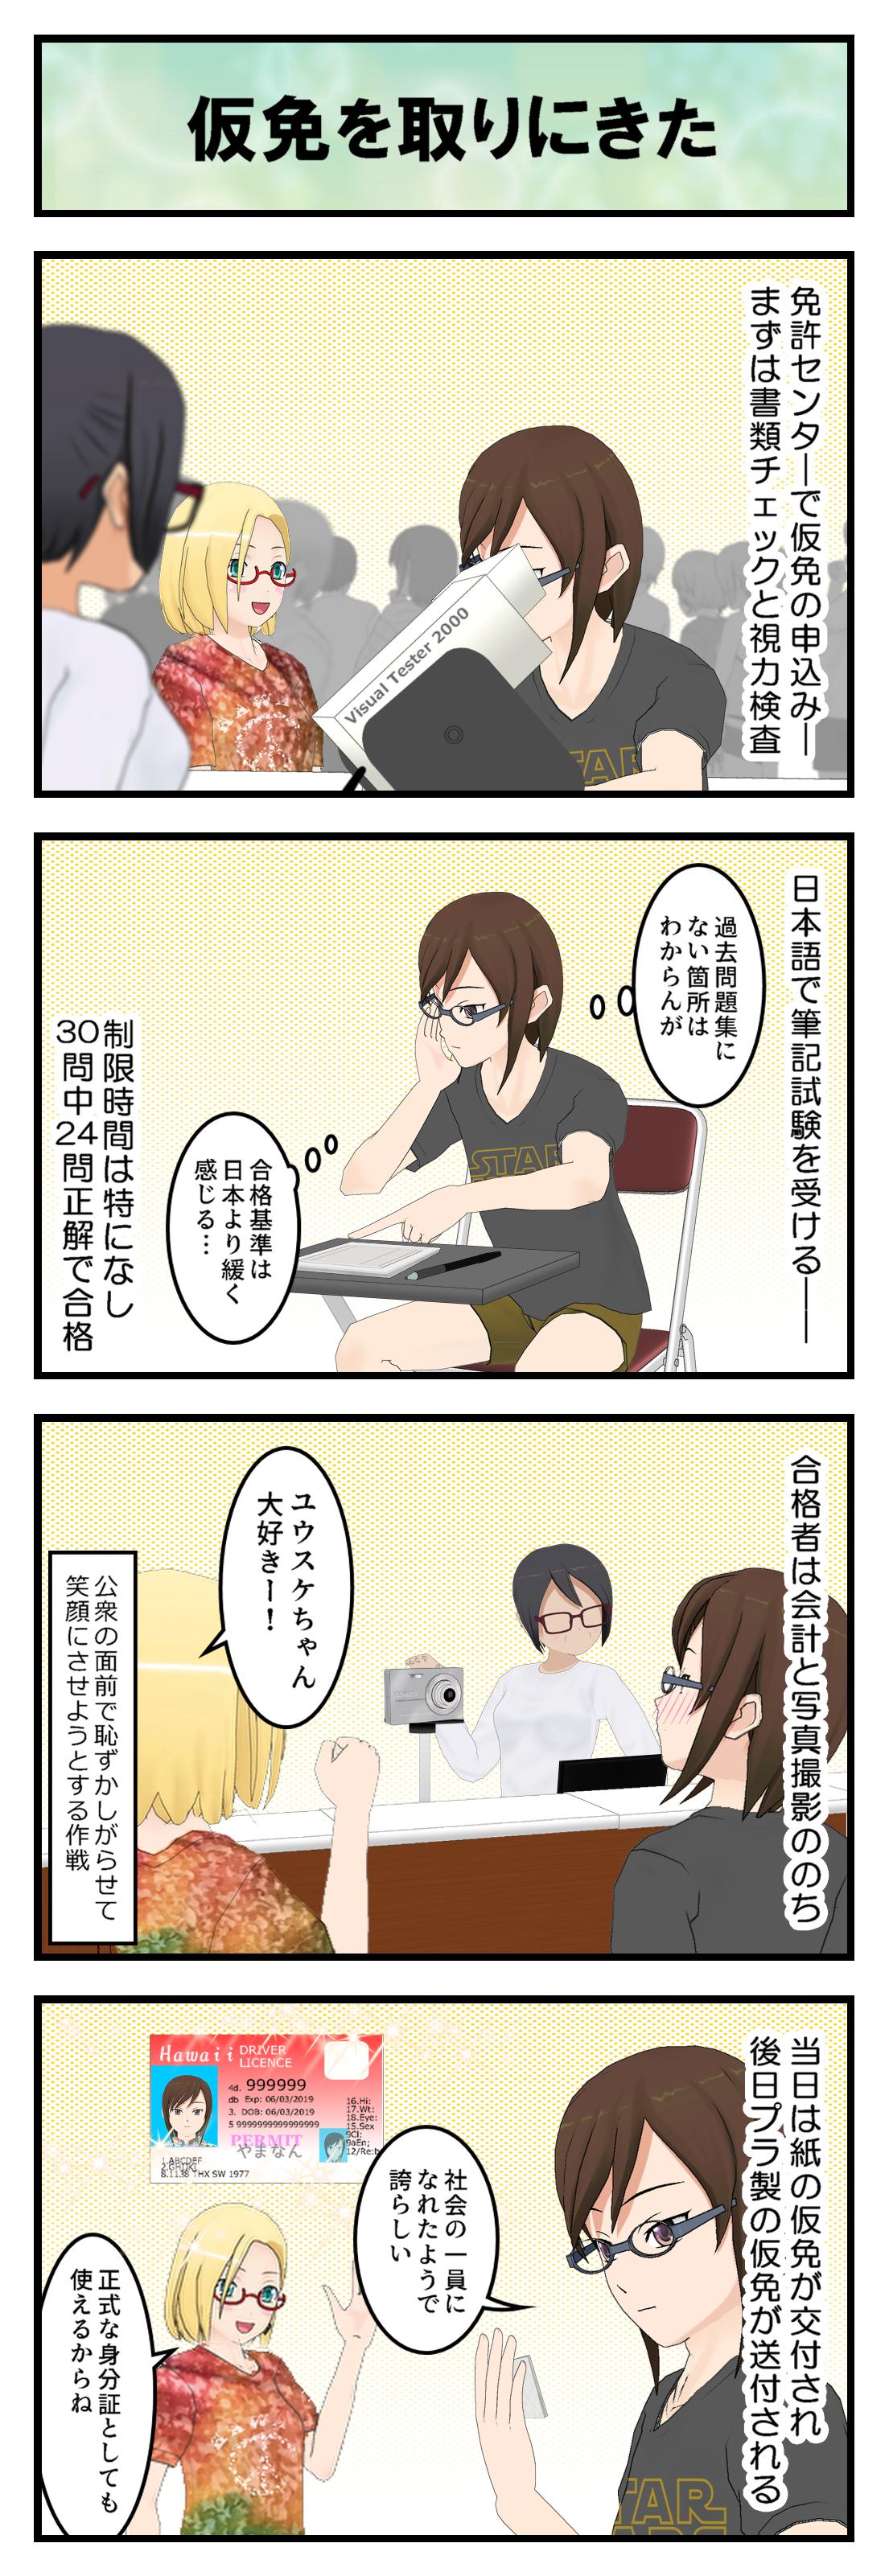 R060_仮免取得_001